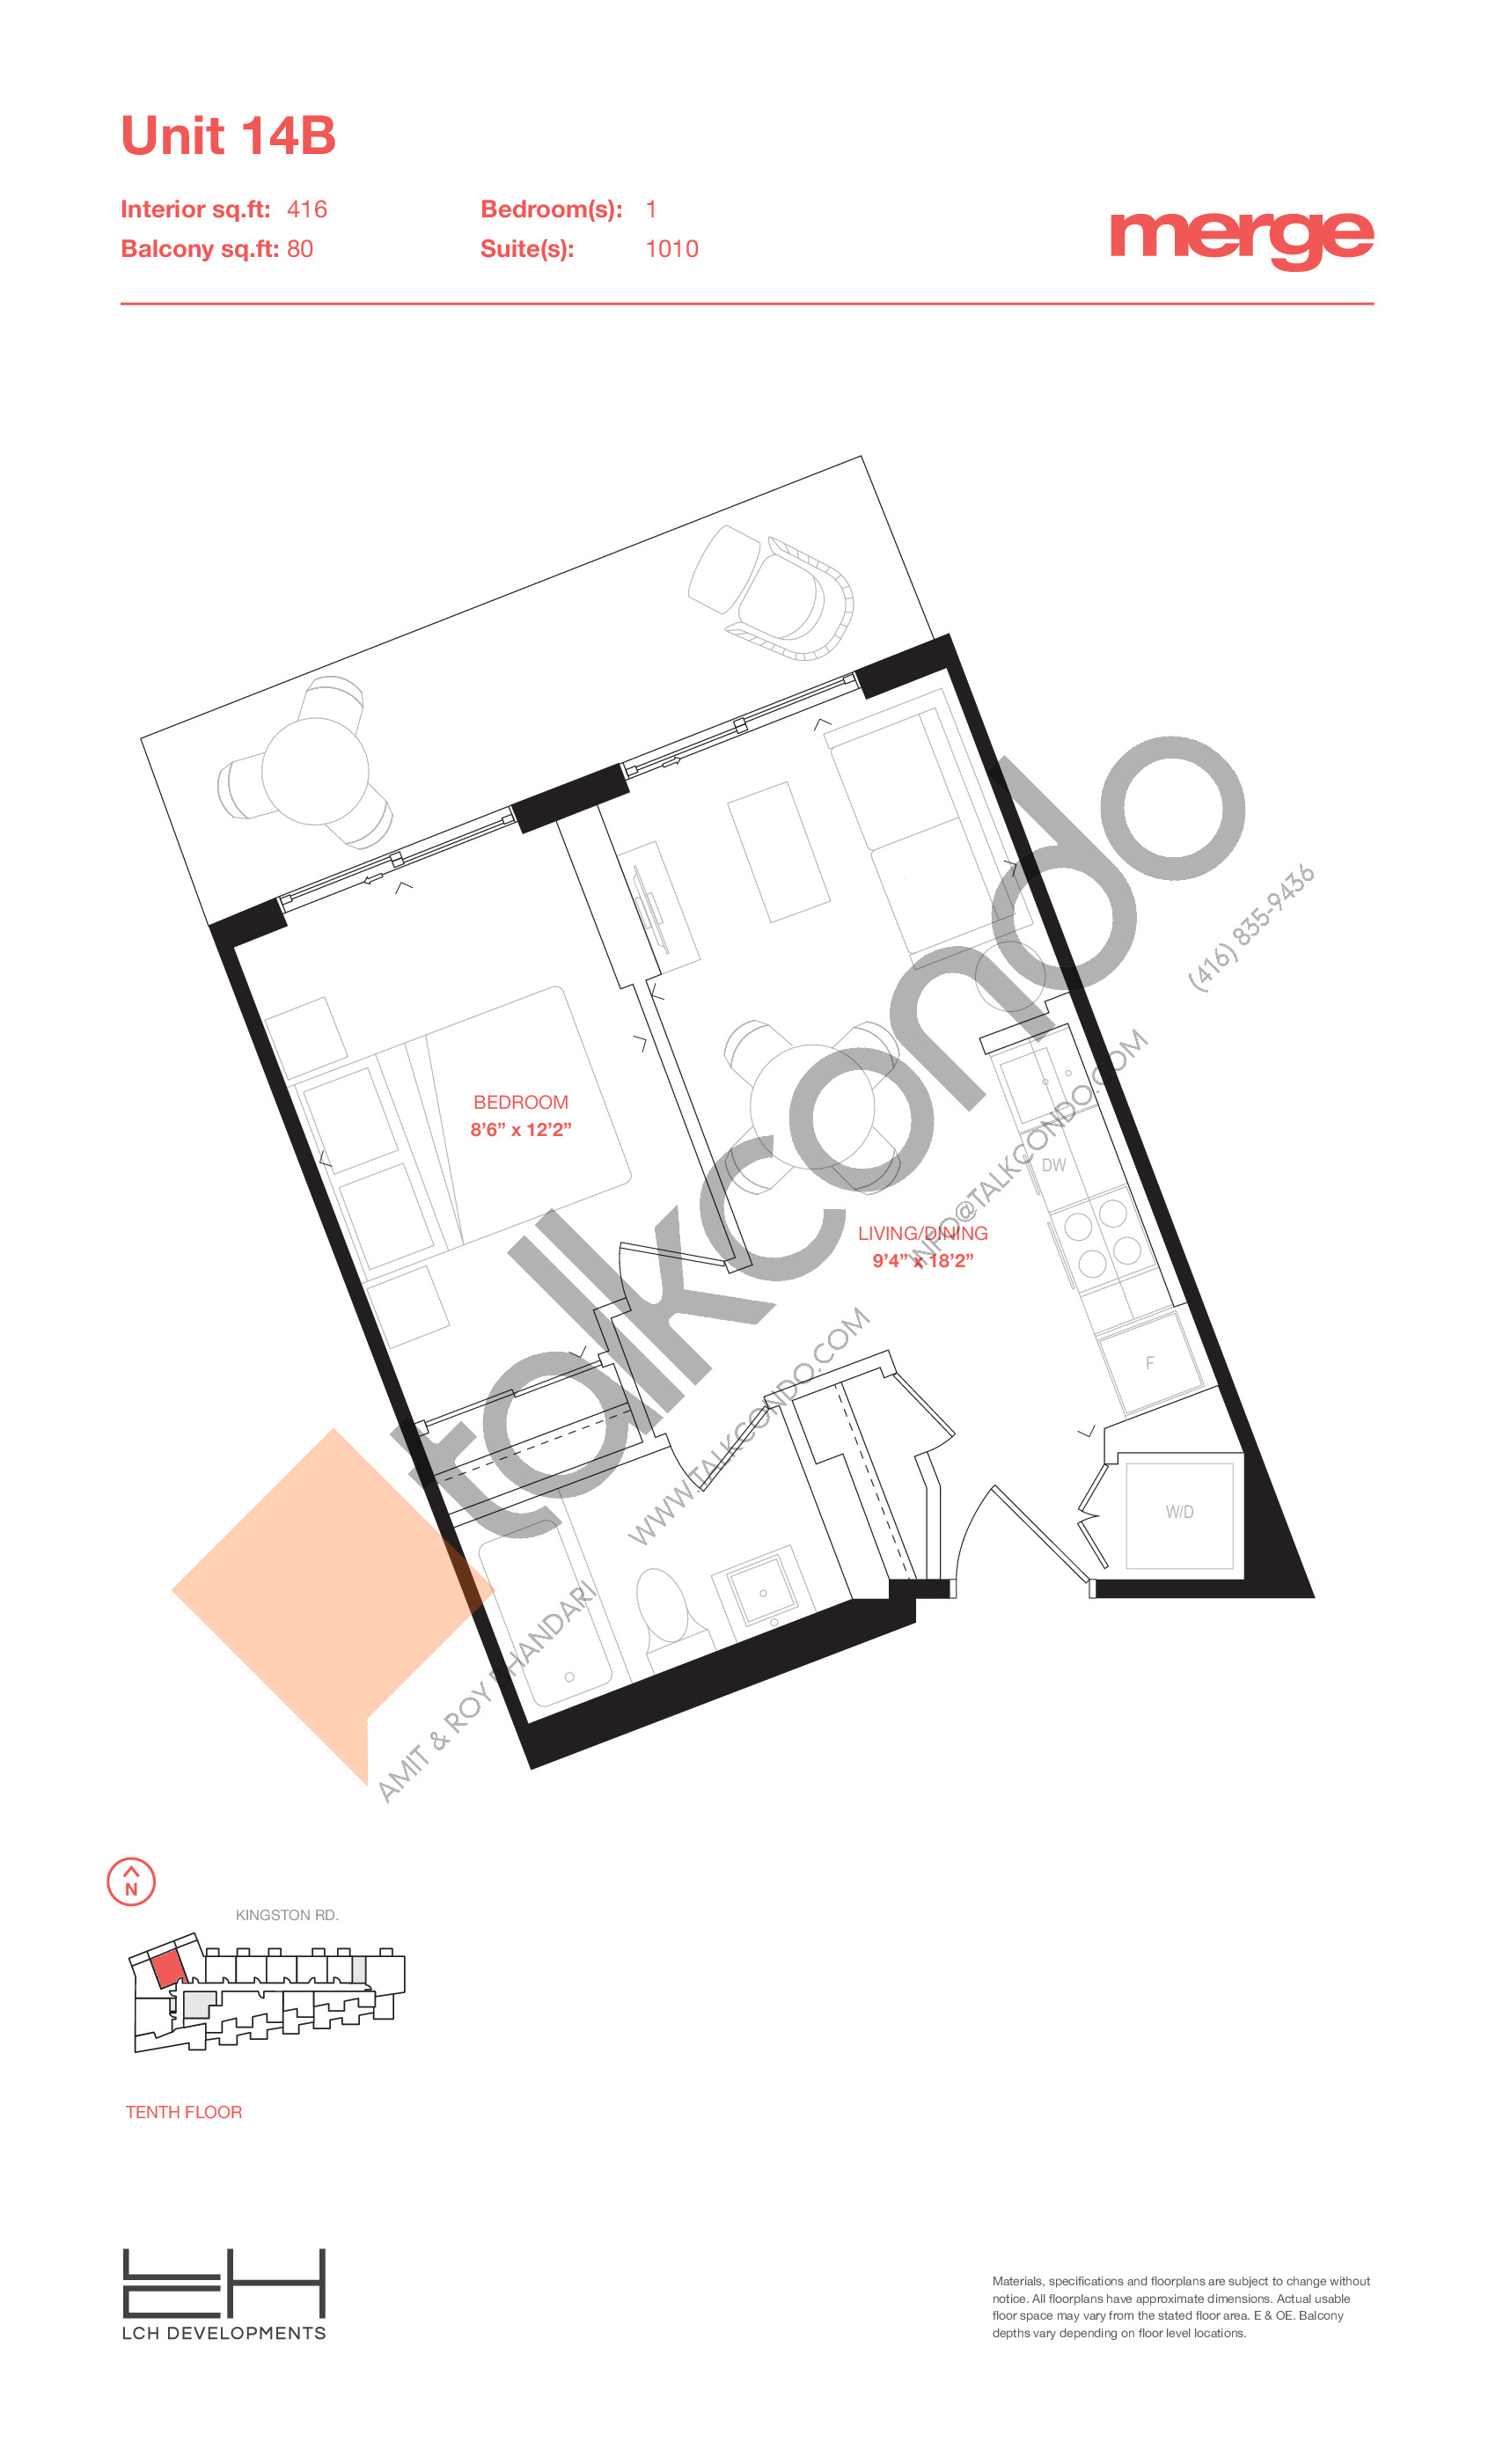 Unit 14B - Tower Floor Plan at Merge Condos - 416 sq.ft